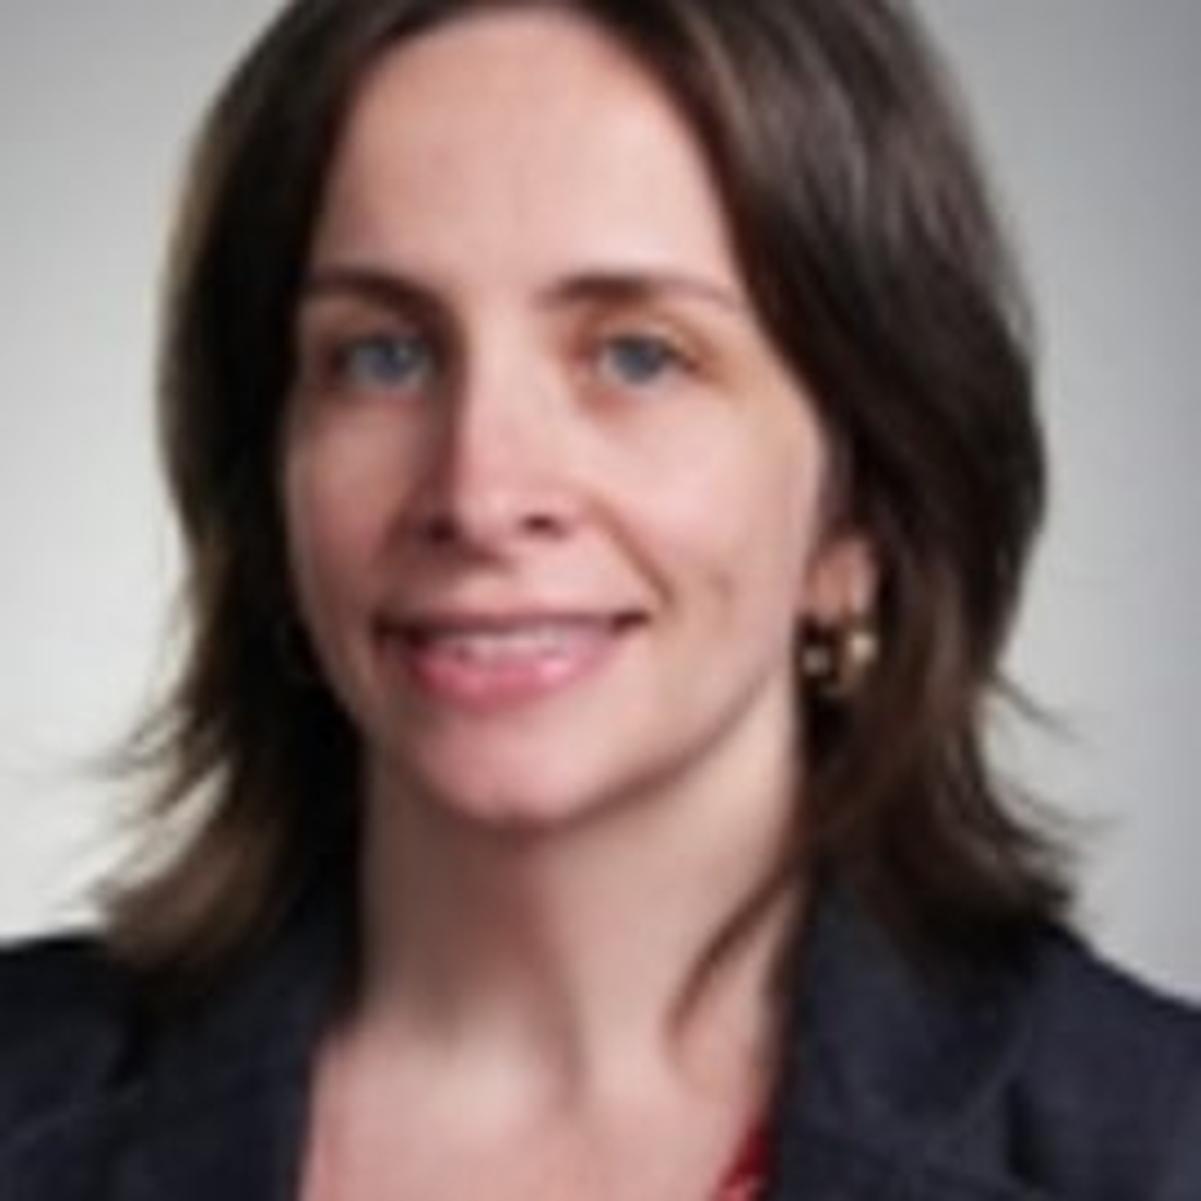 Sarah O. Ladislaw